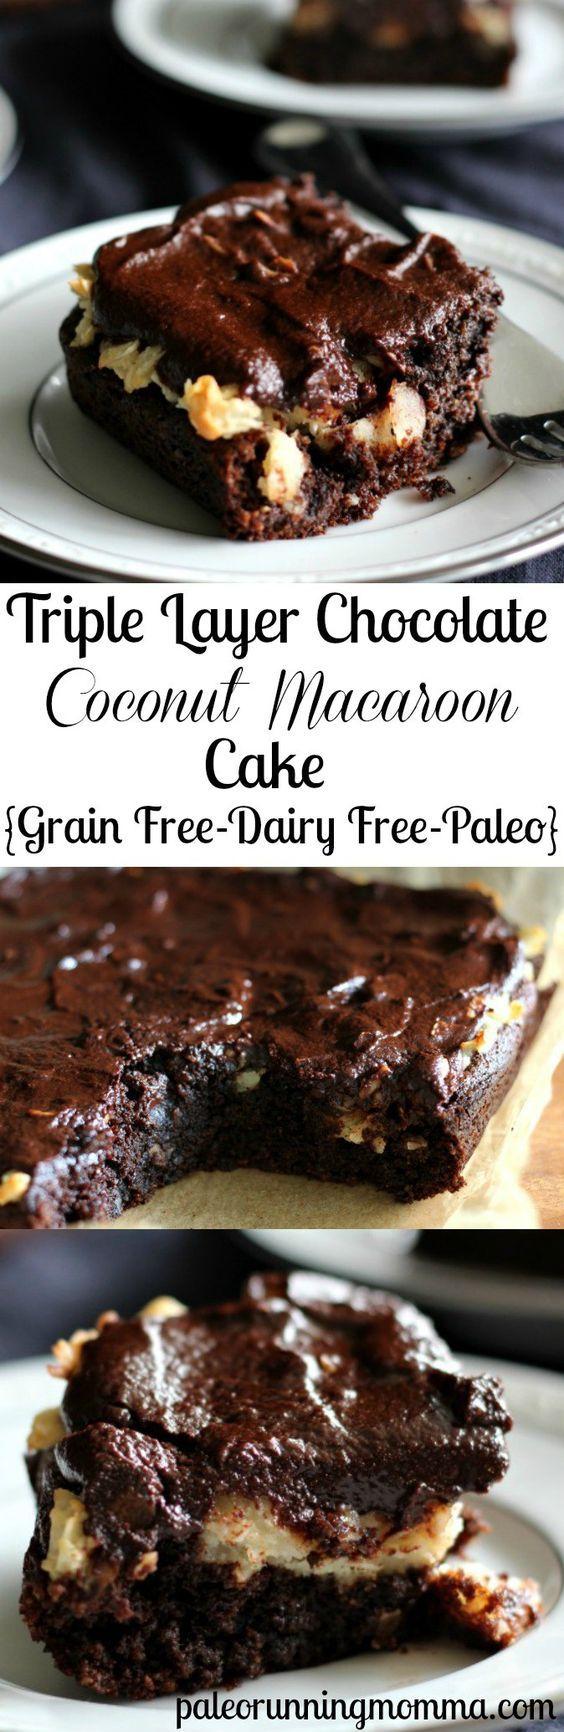 Triple Layer Chocolate Coconut Macaroon Cake - Gluten FreeTriple Layer Chocolate Coconut Macaroon Cake - Gluten Free